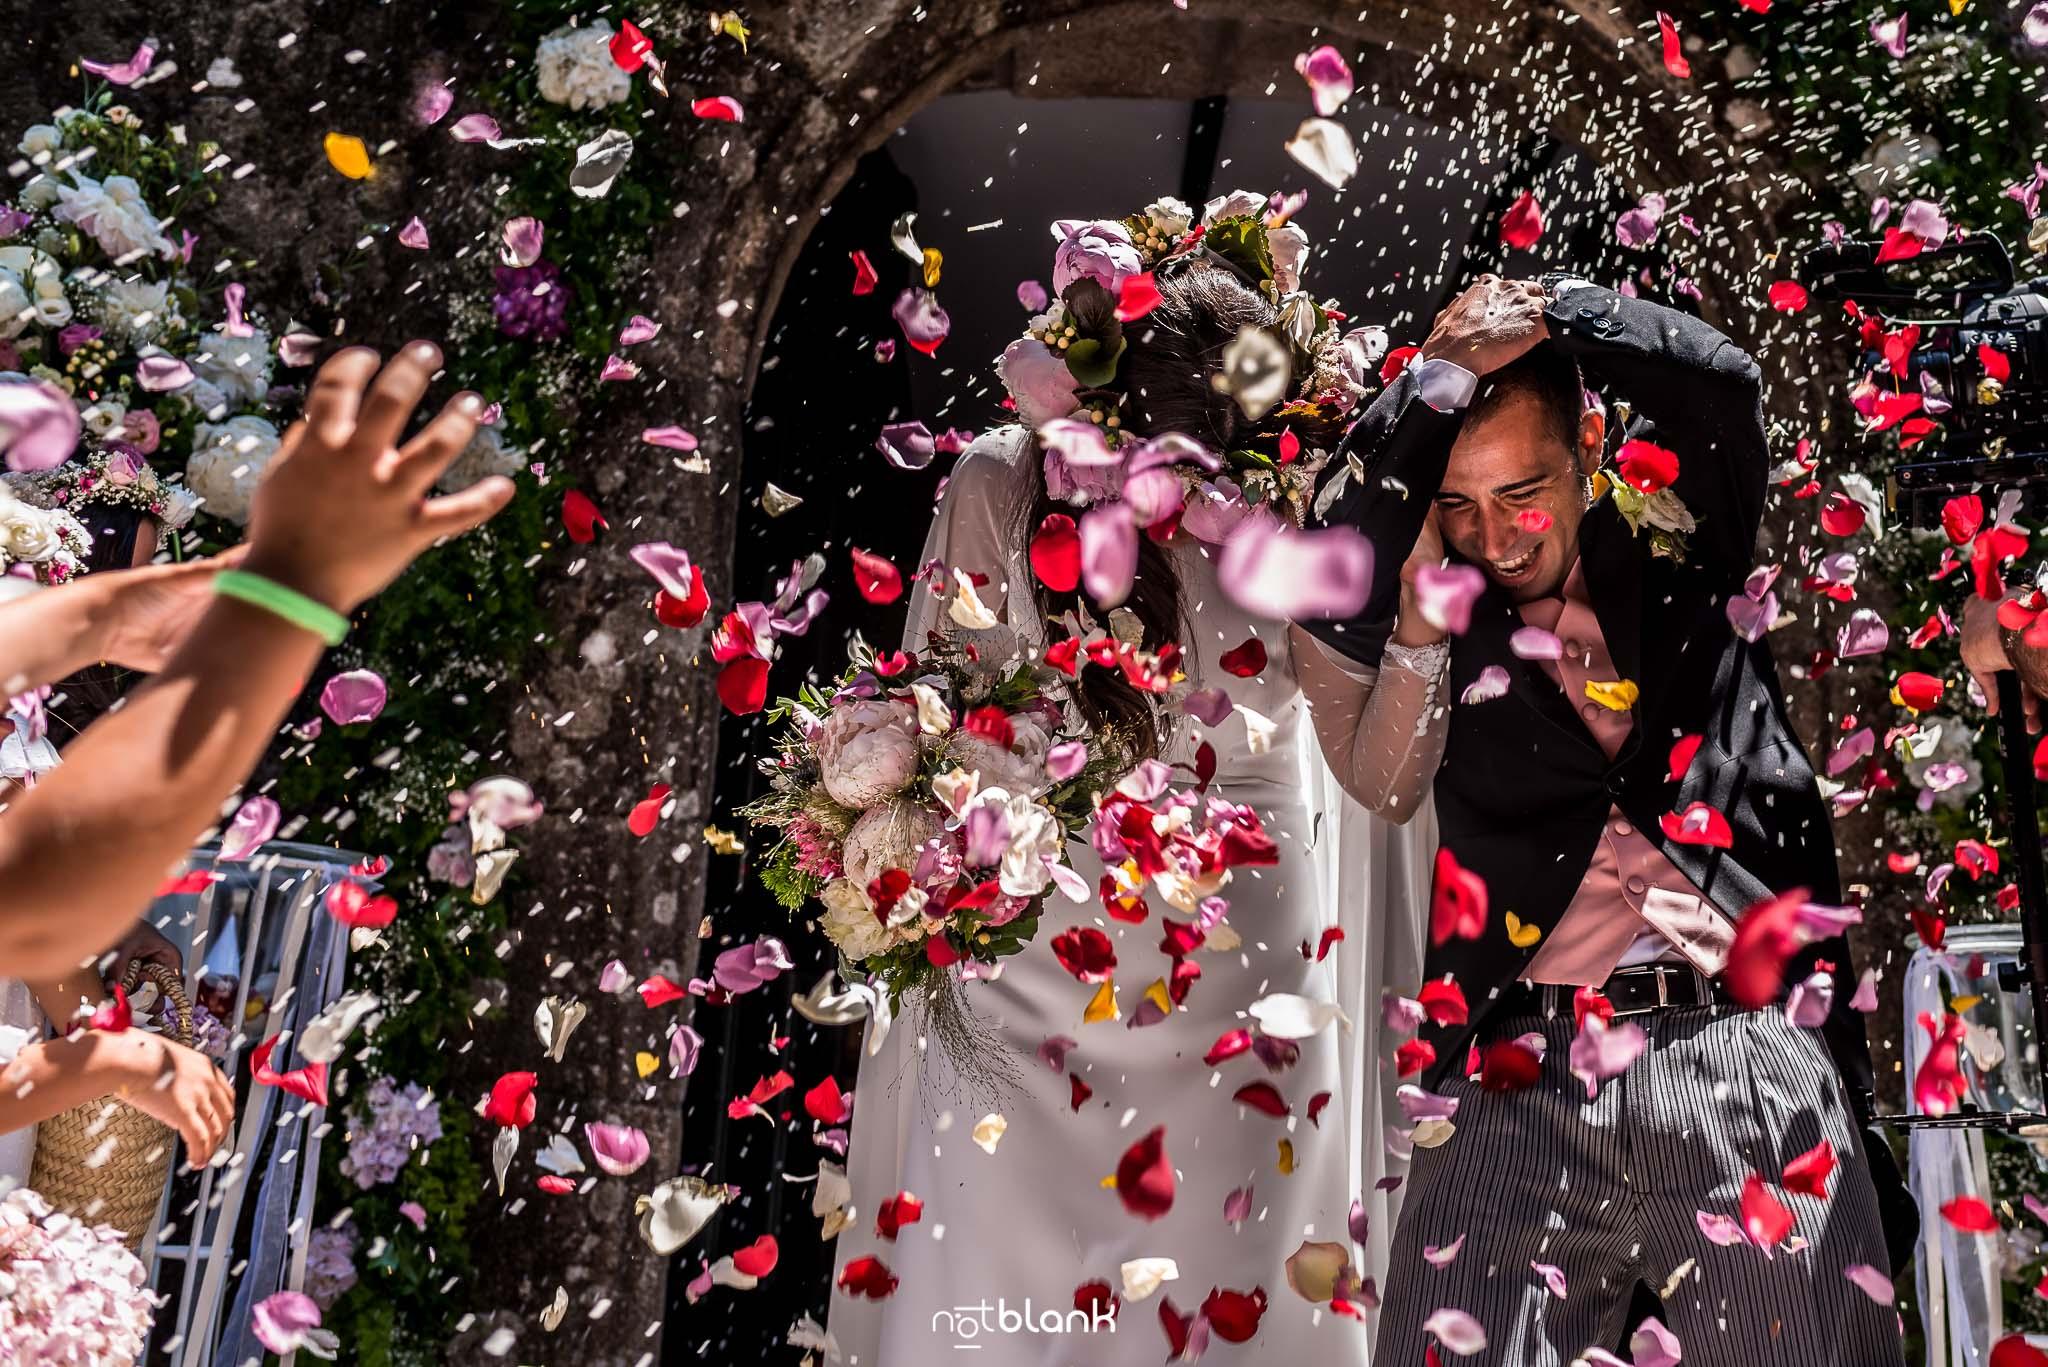 Notblank | Fotógrafos de Boda en Tui (Galicia) | Fotografos Vigo |Fotografos Ourense | Fotografos Galicia | Fotografos Coruña | Fotografos Santiago | Fotografos Lugo | Estilo documental